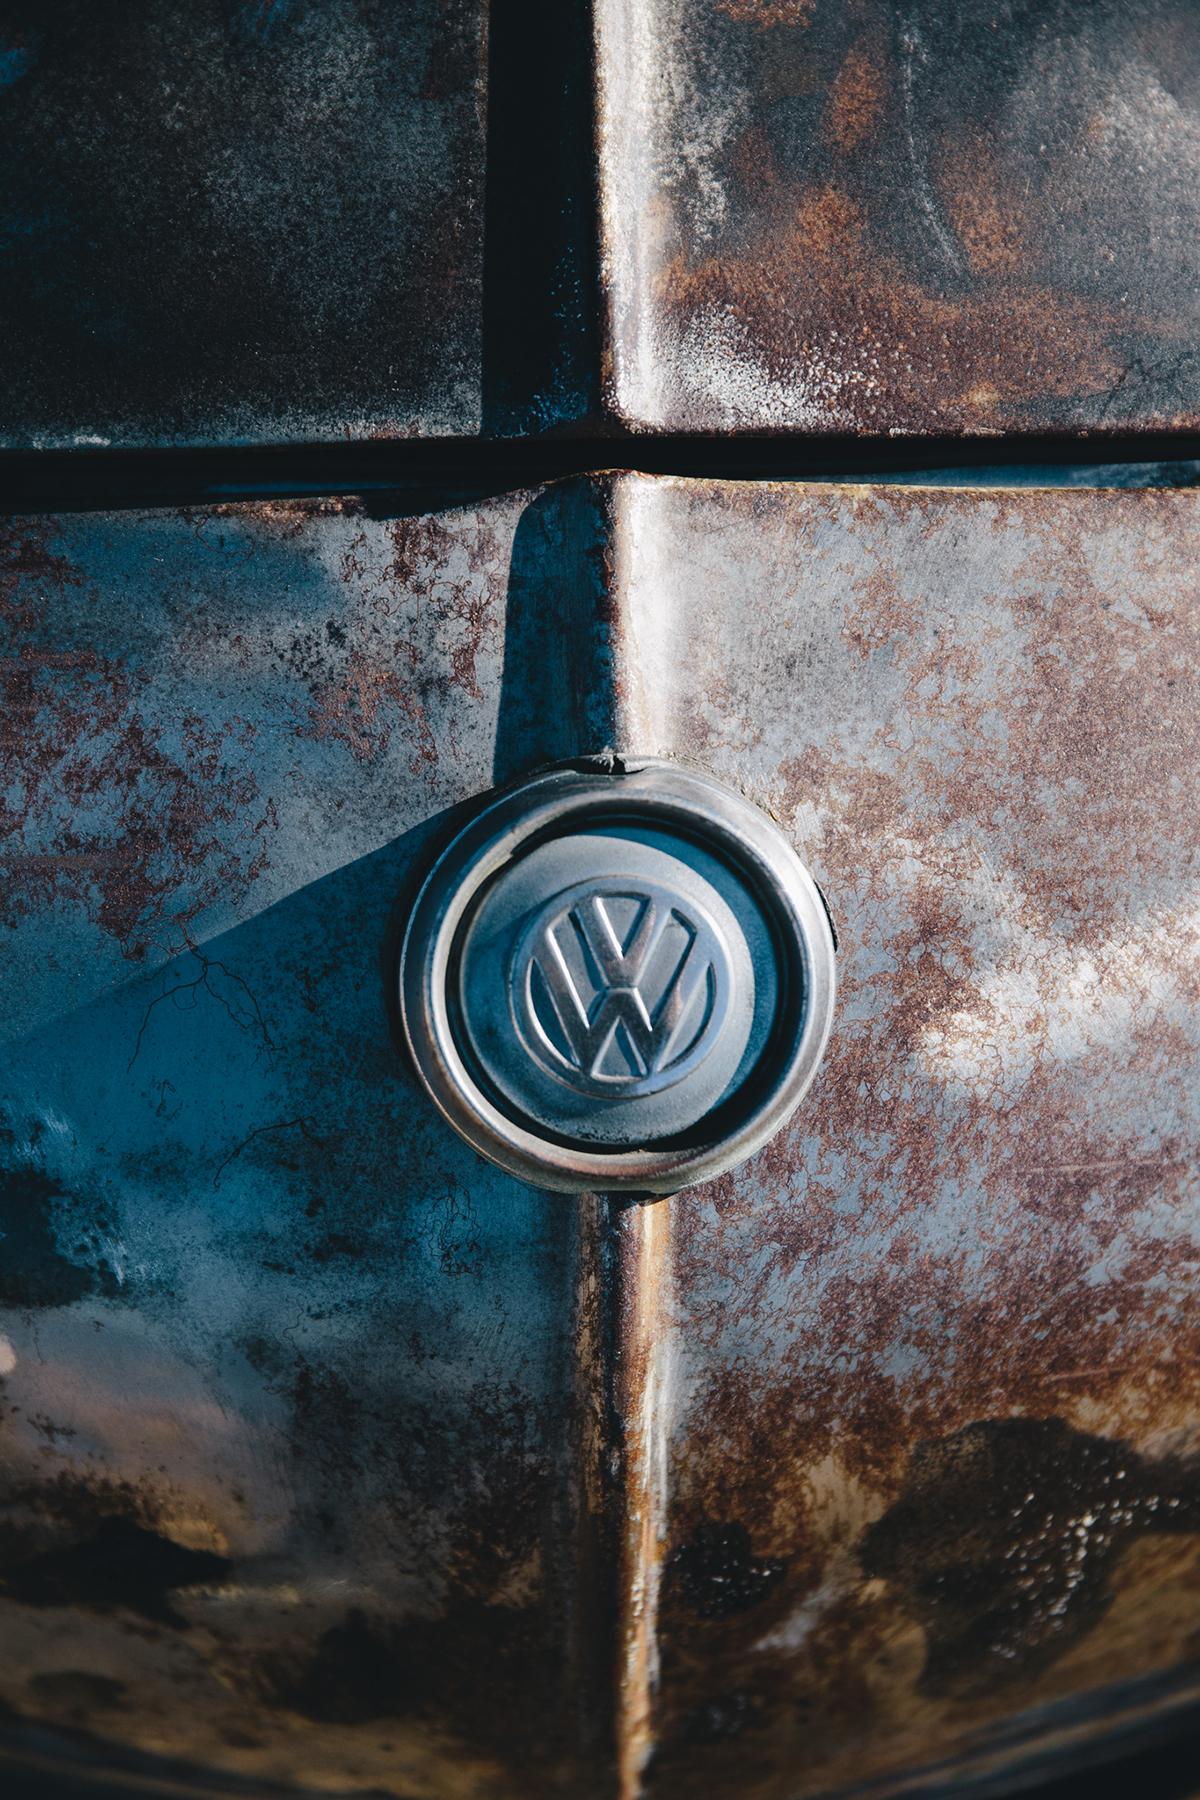 Volkswagen_Karmann _Ghia_Rat20160725 (4)